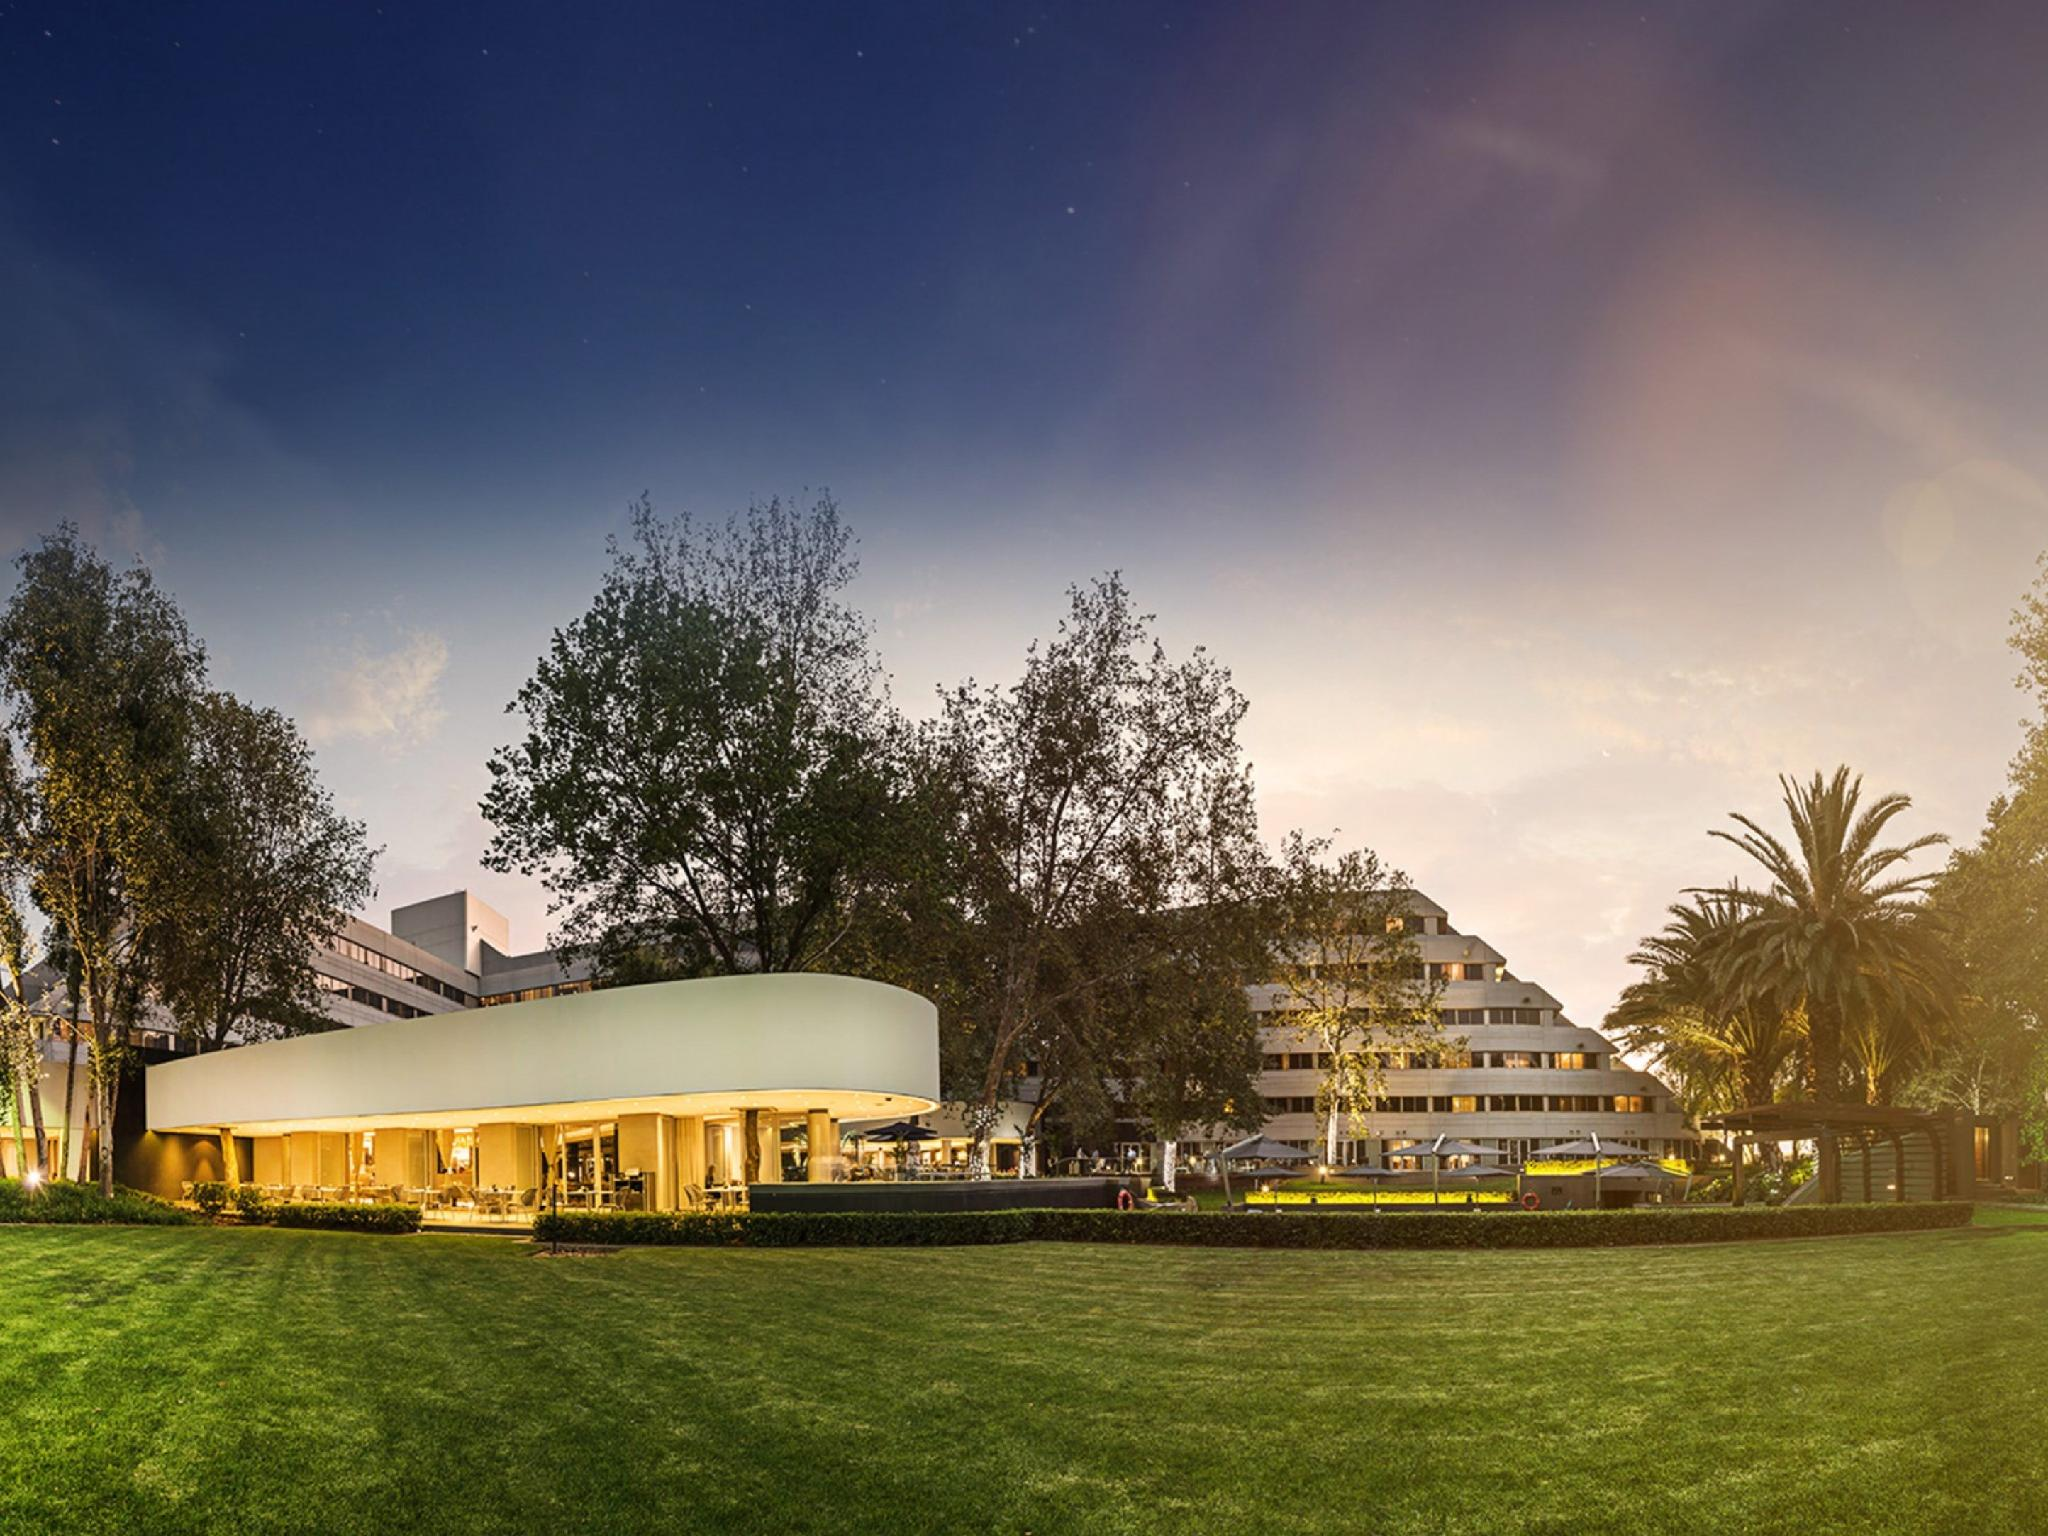 The Maslow Hotel Sandton